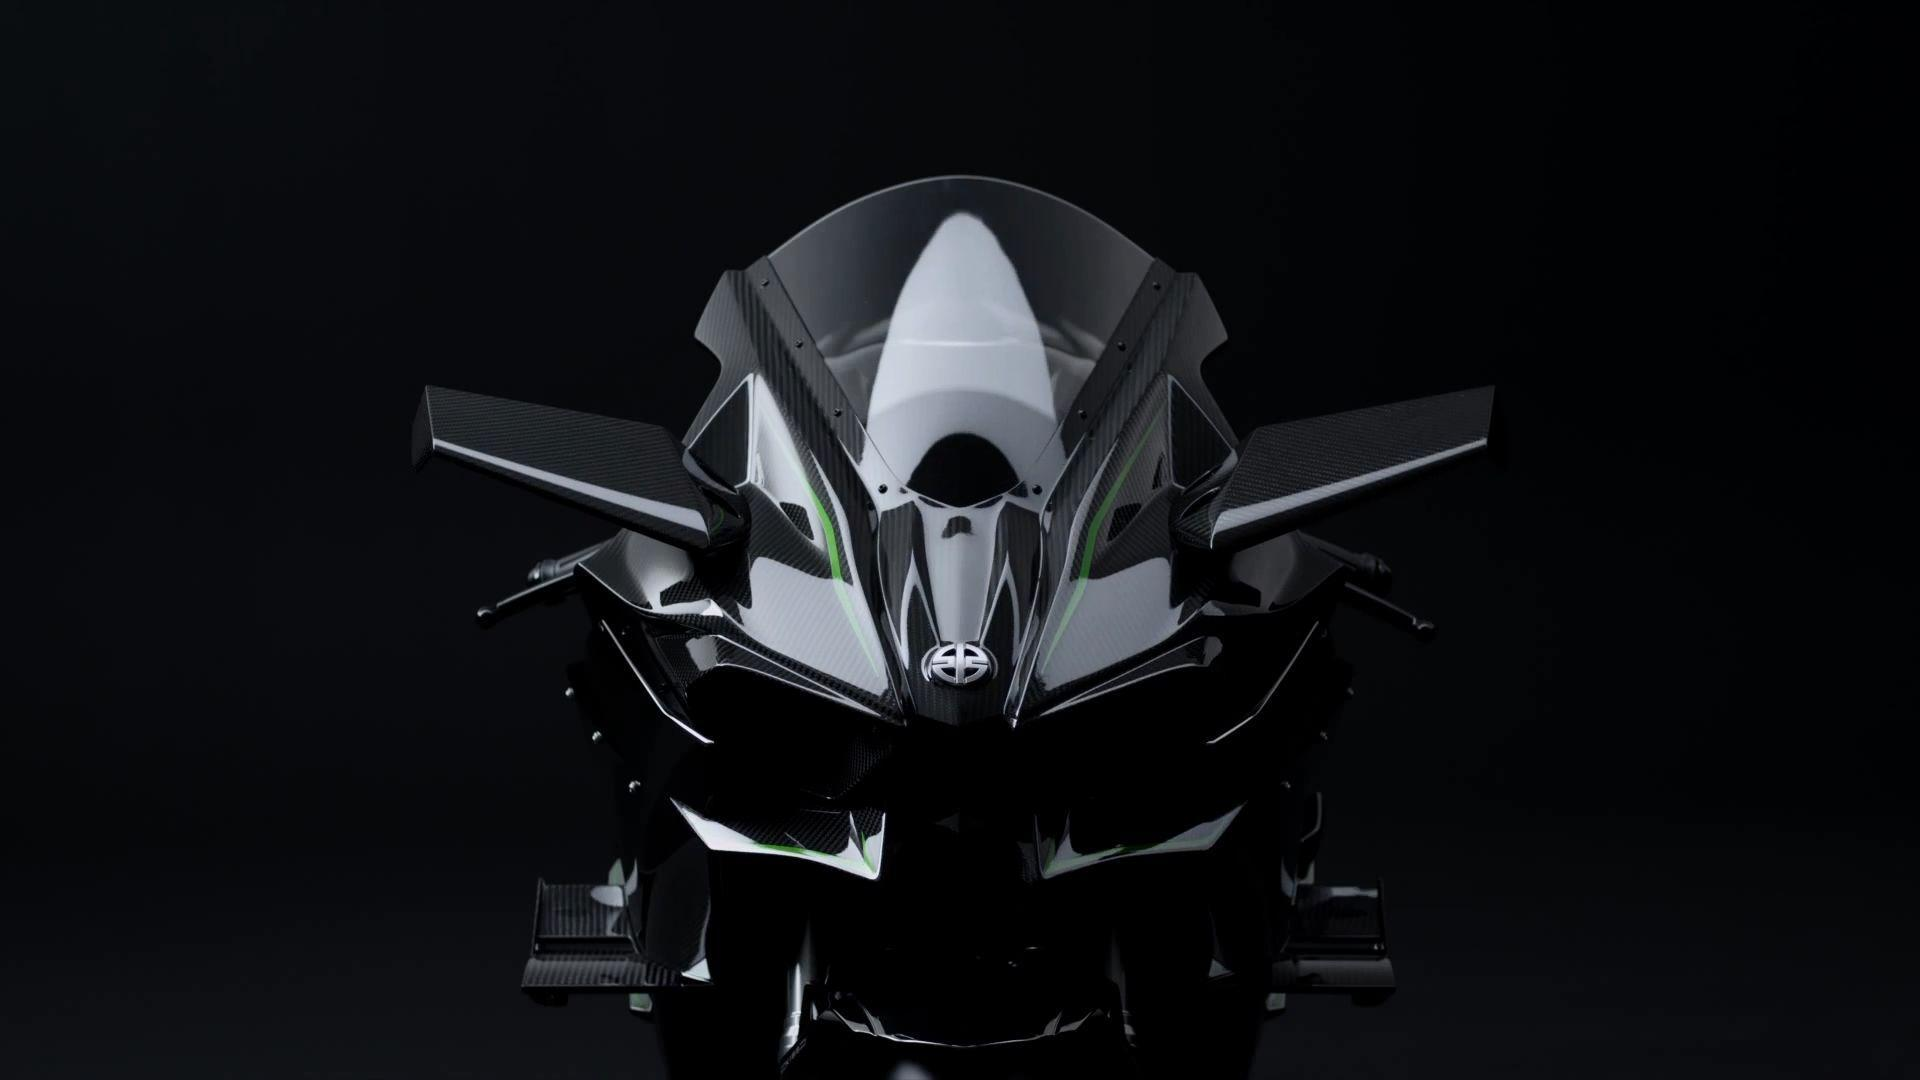 Kawasaki Ninja H2R Wallpapers